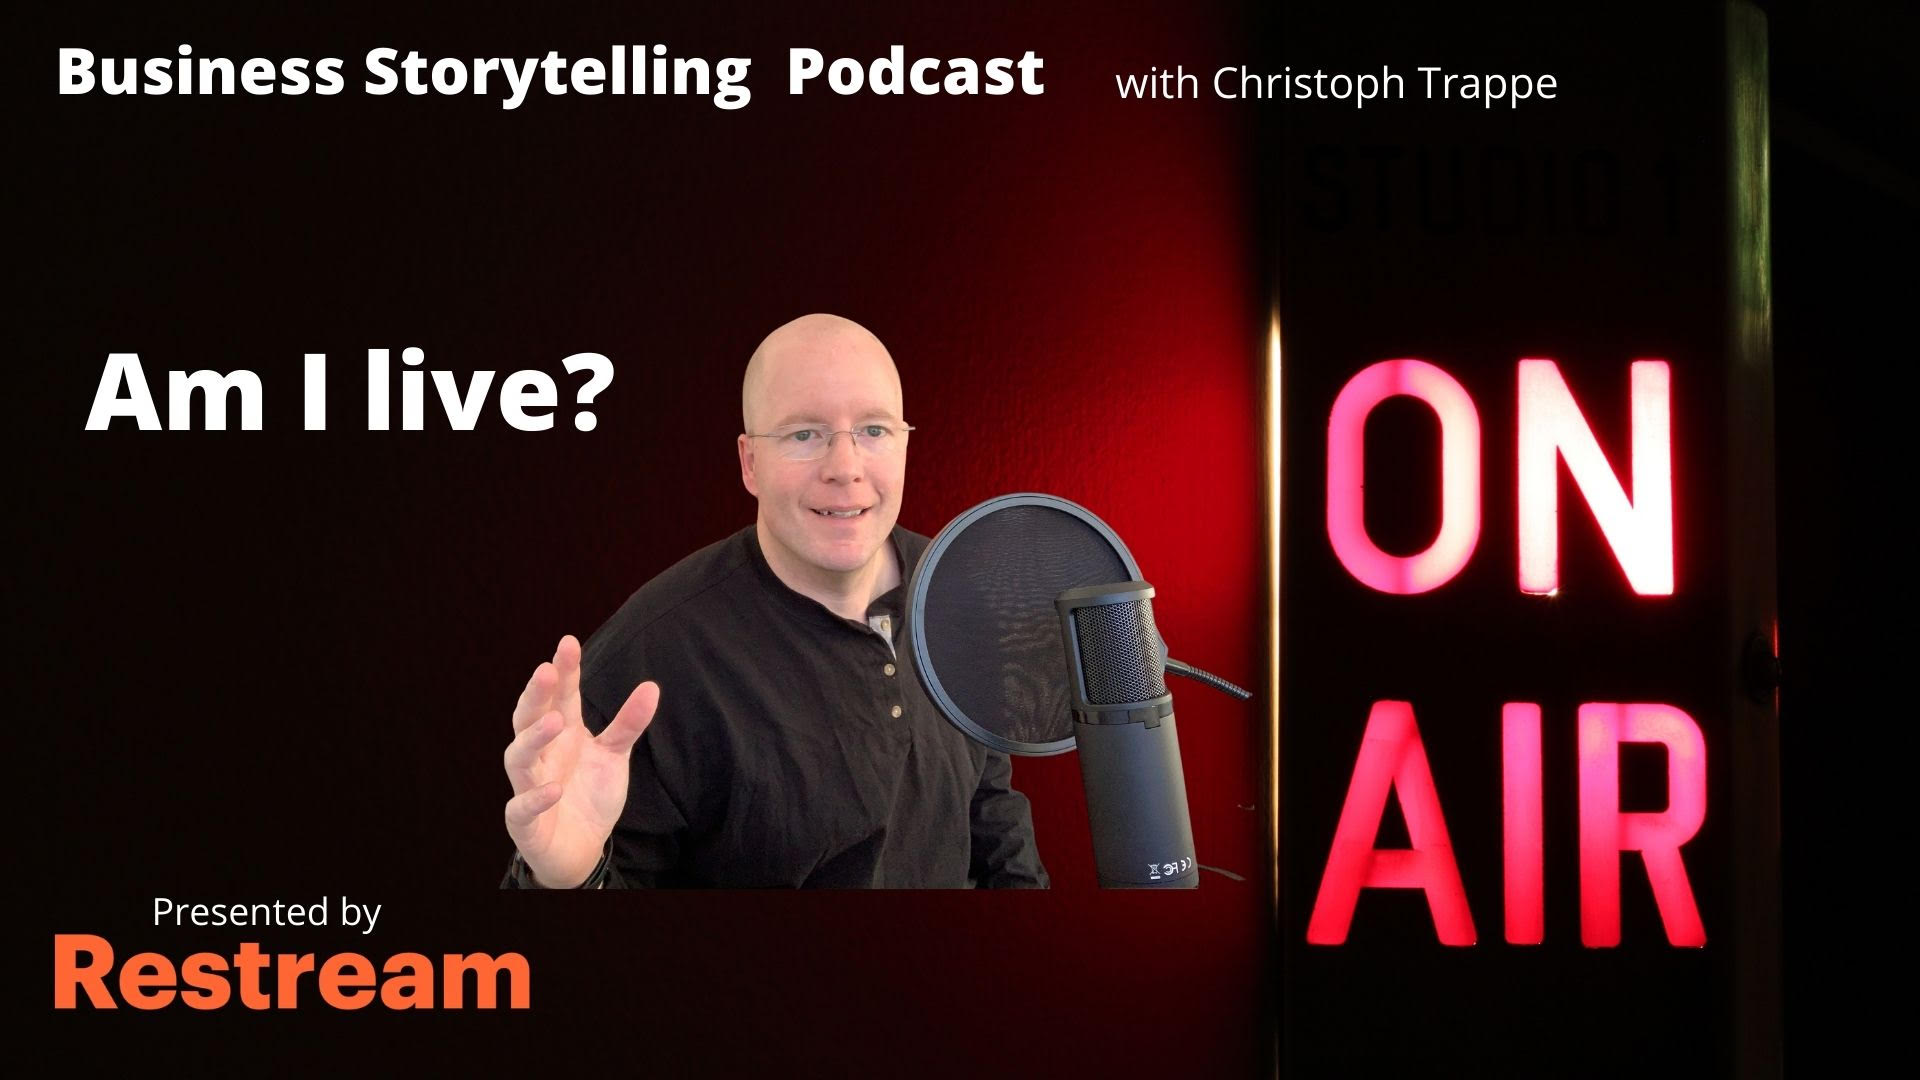 Am I live? How to make sure your livestream works - Content + Digital Marketing Tips